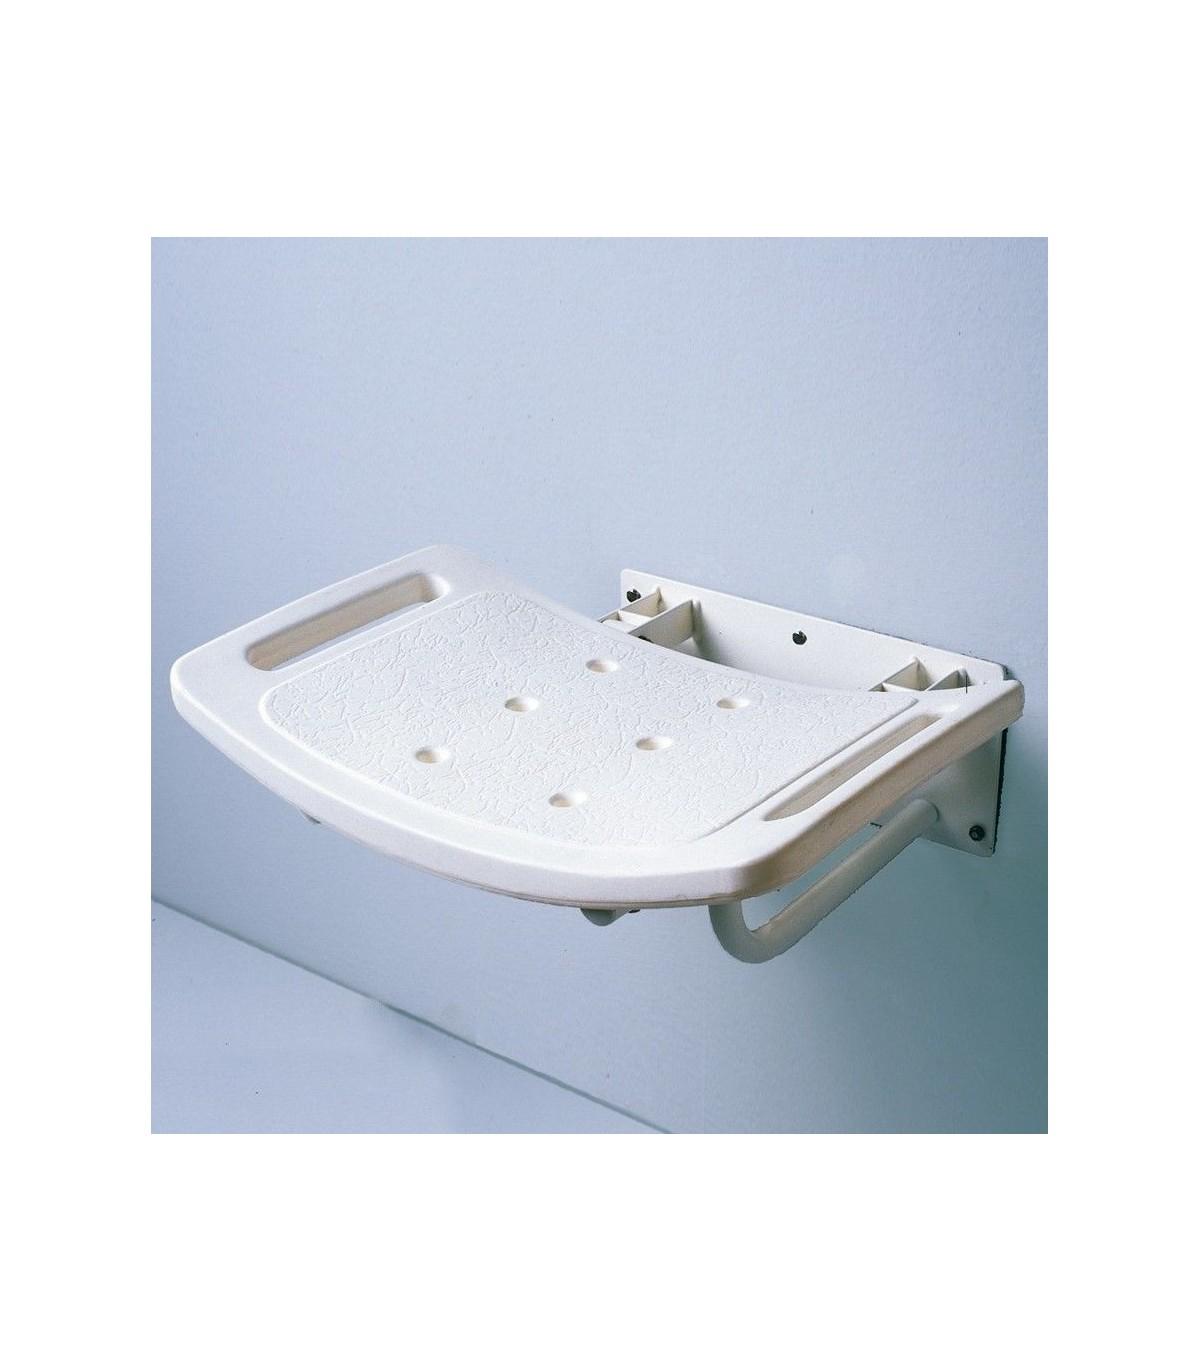 silla de ducha plegable anclada